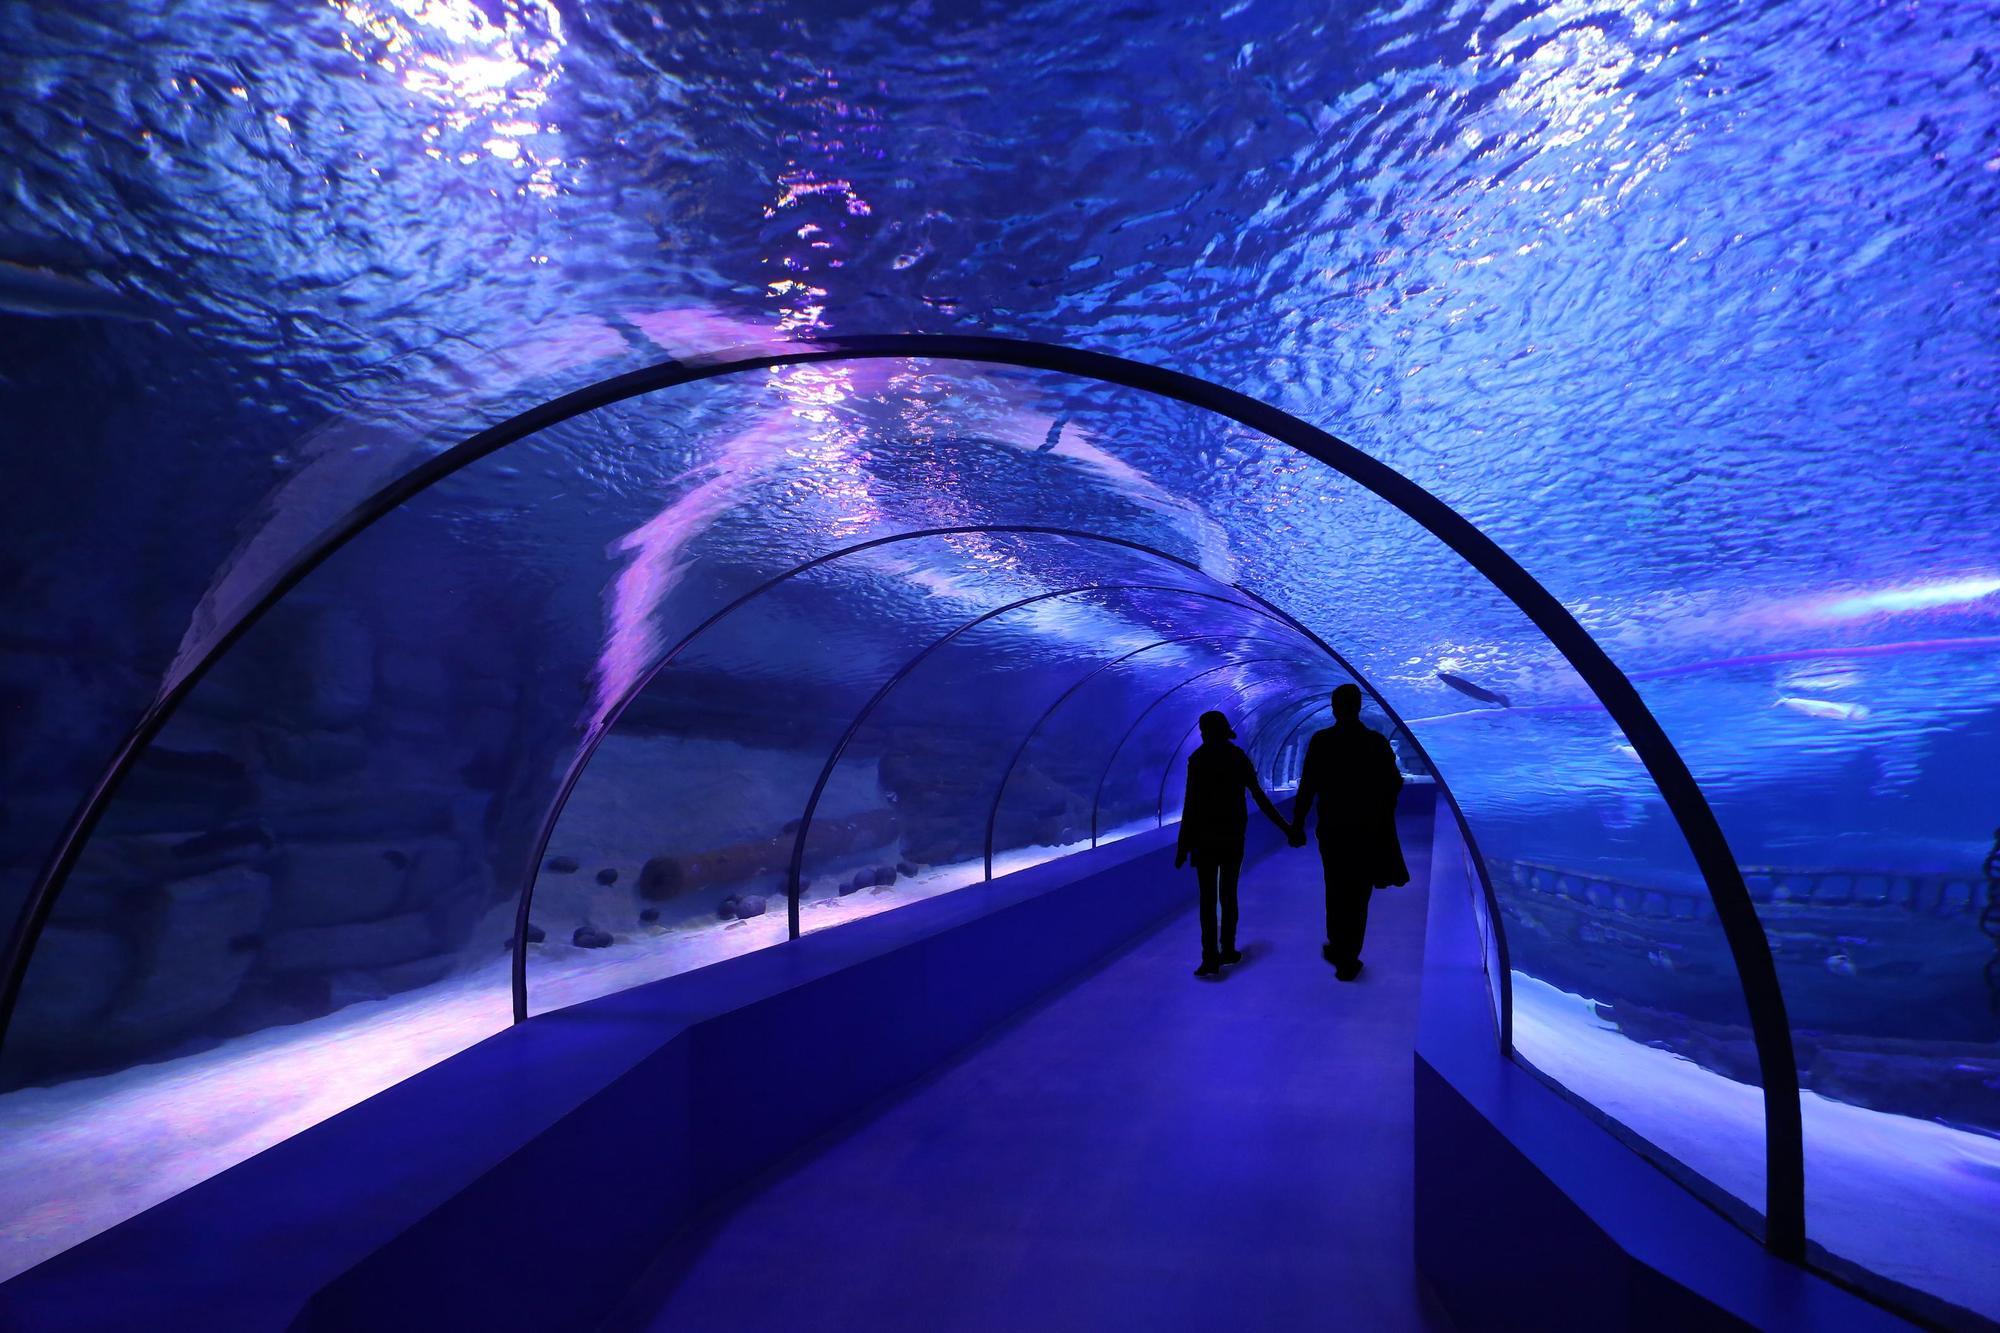 Aquarium Antalya - Catt Tour Antalya